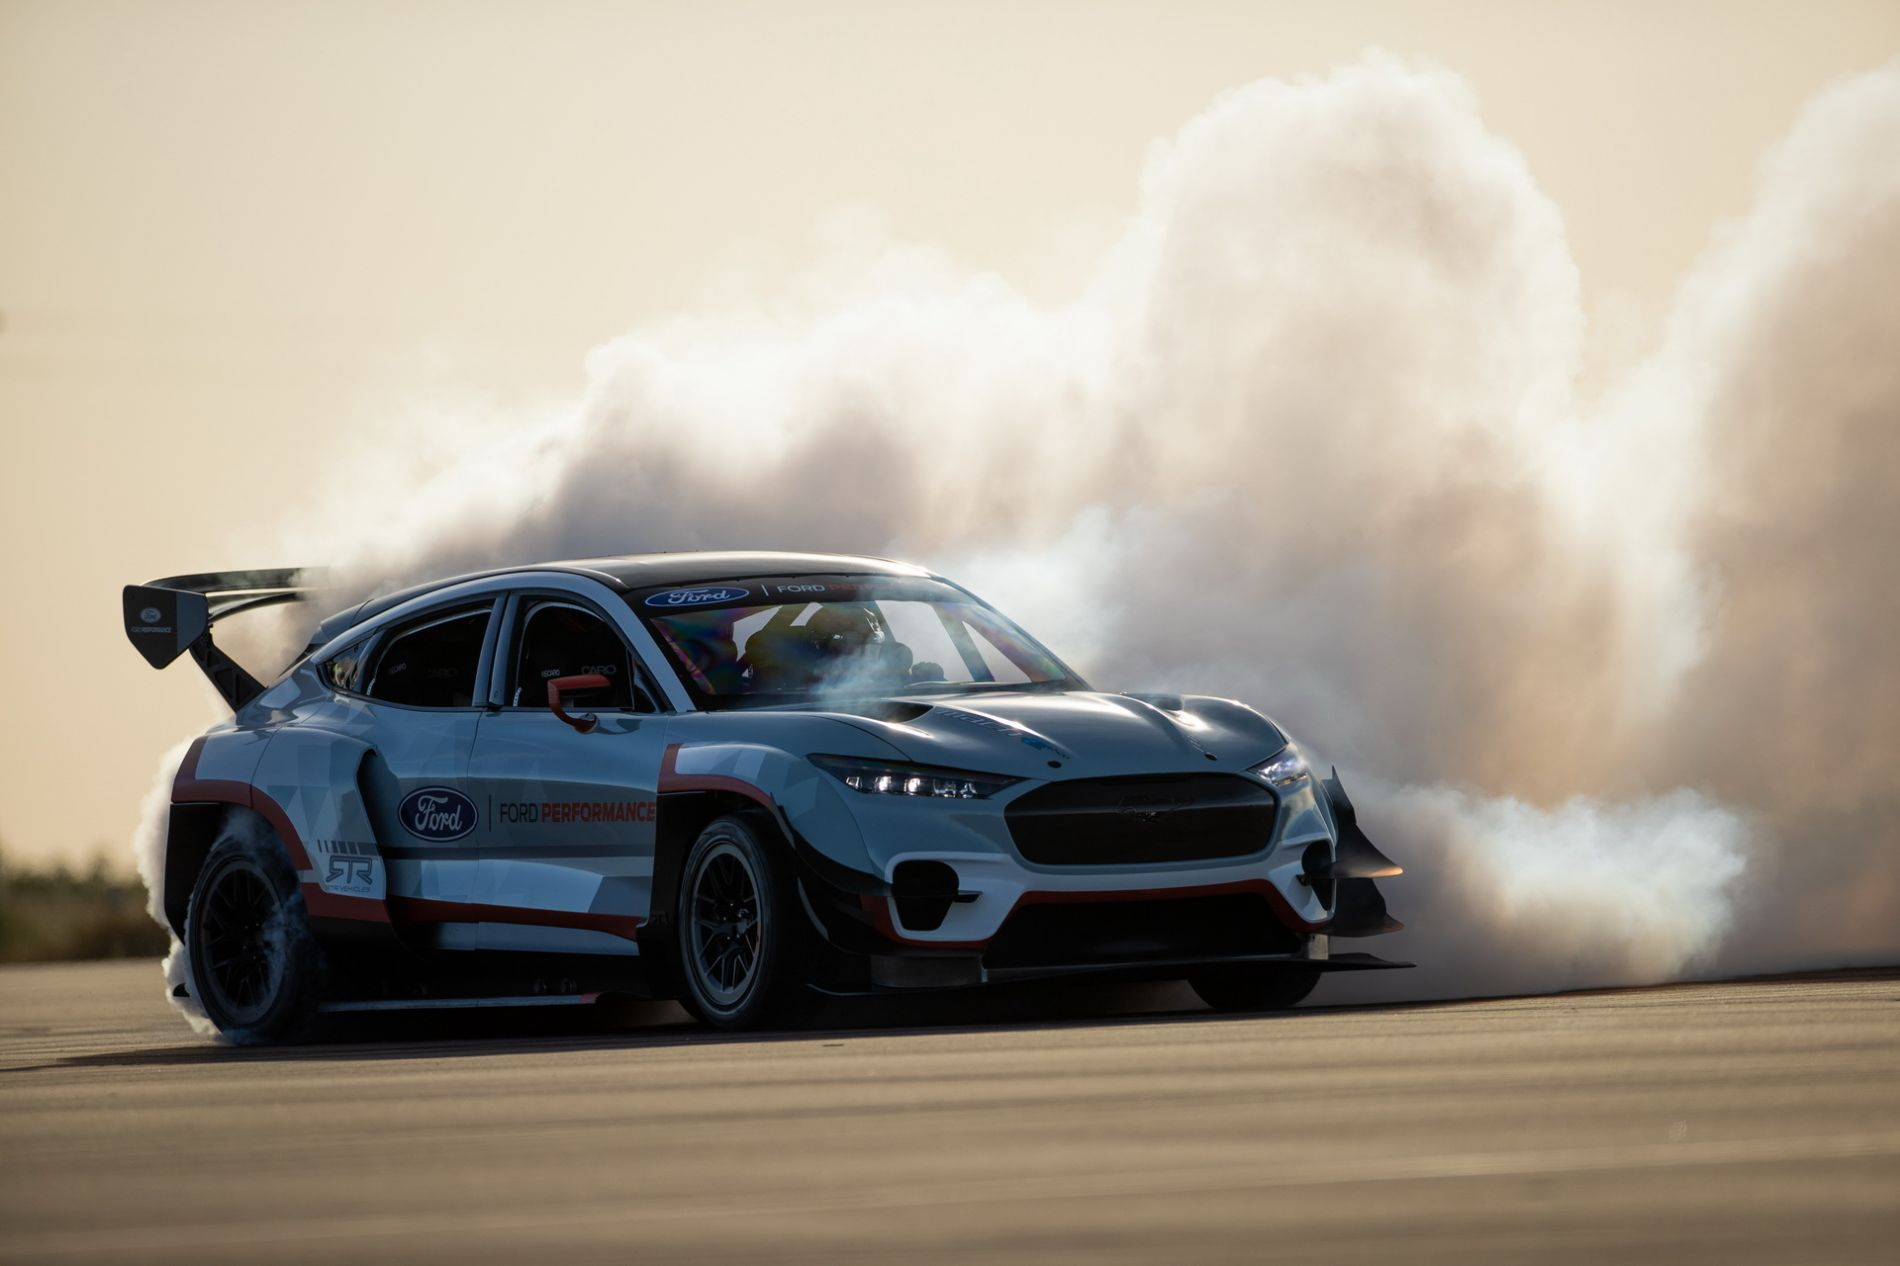 Mustang Mach-E 1400 - ელექტრო დრიფტ-ქარი